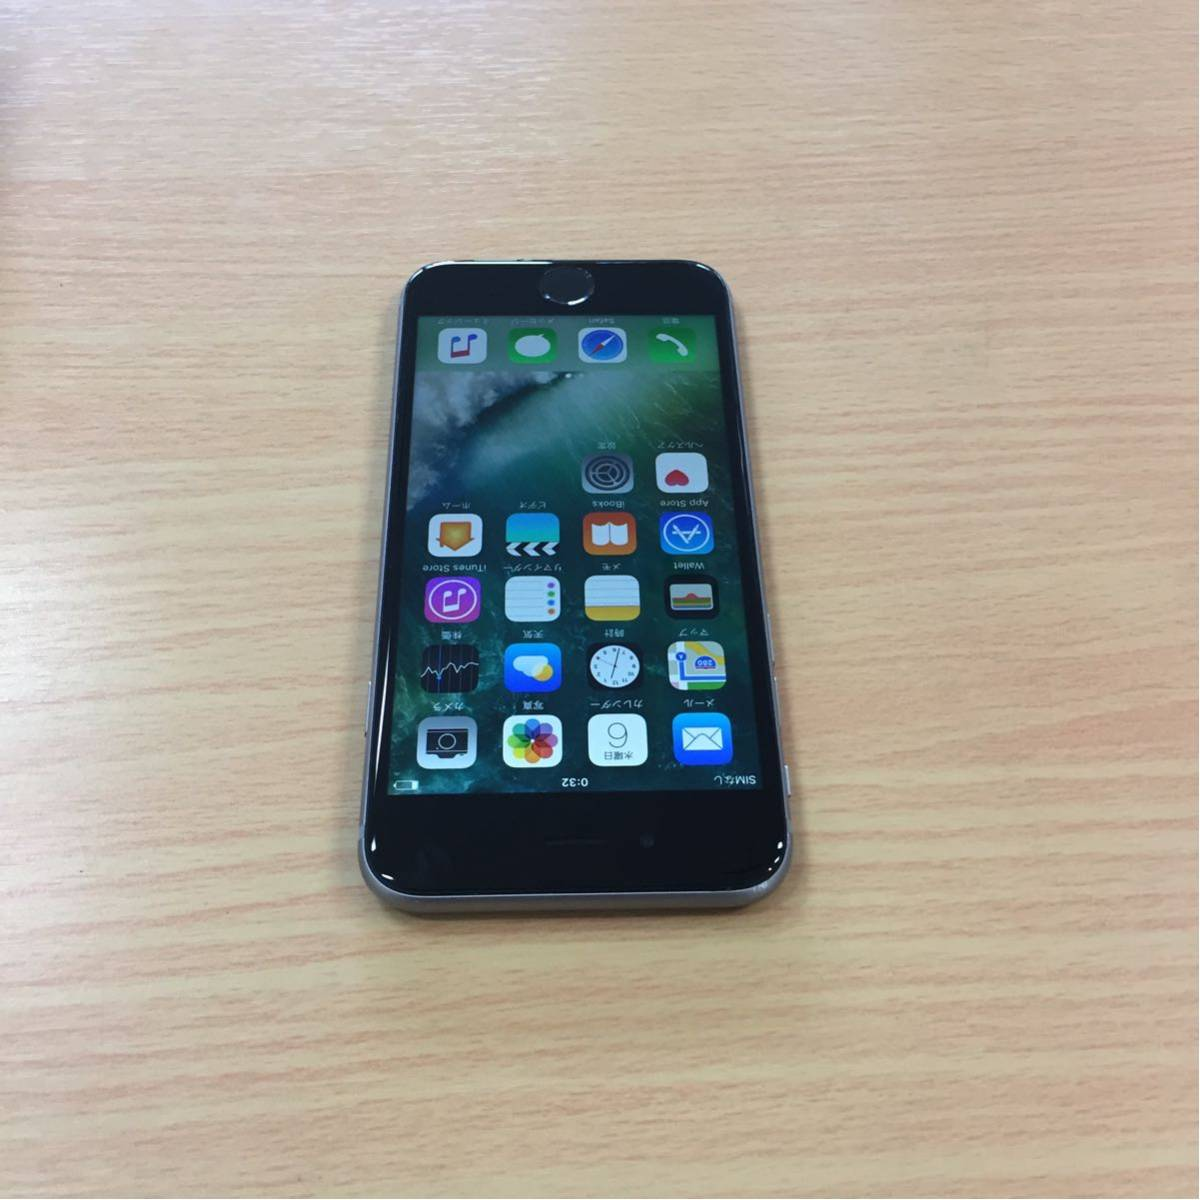 au iPhone6s 128GB グレー 10.3.3 MKQT2J/A 制限○_画像2